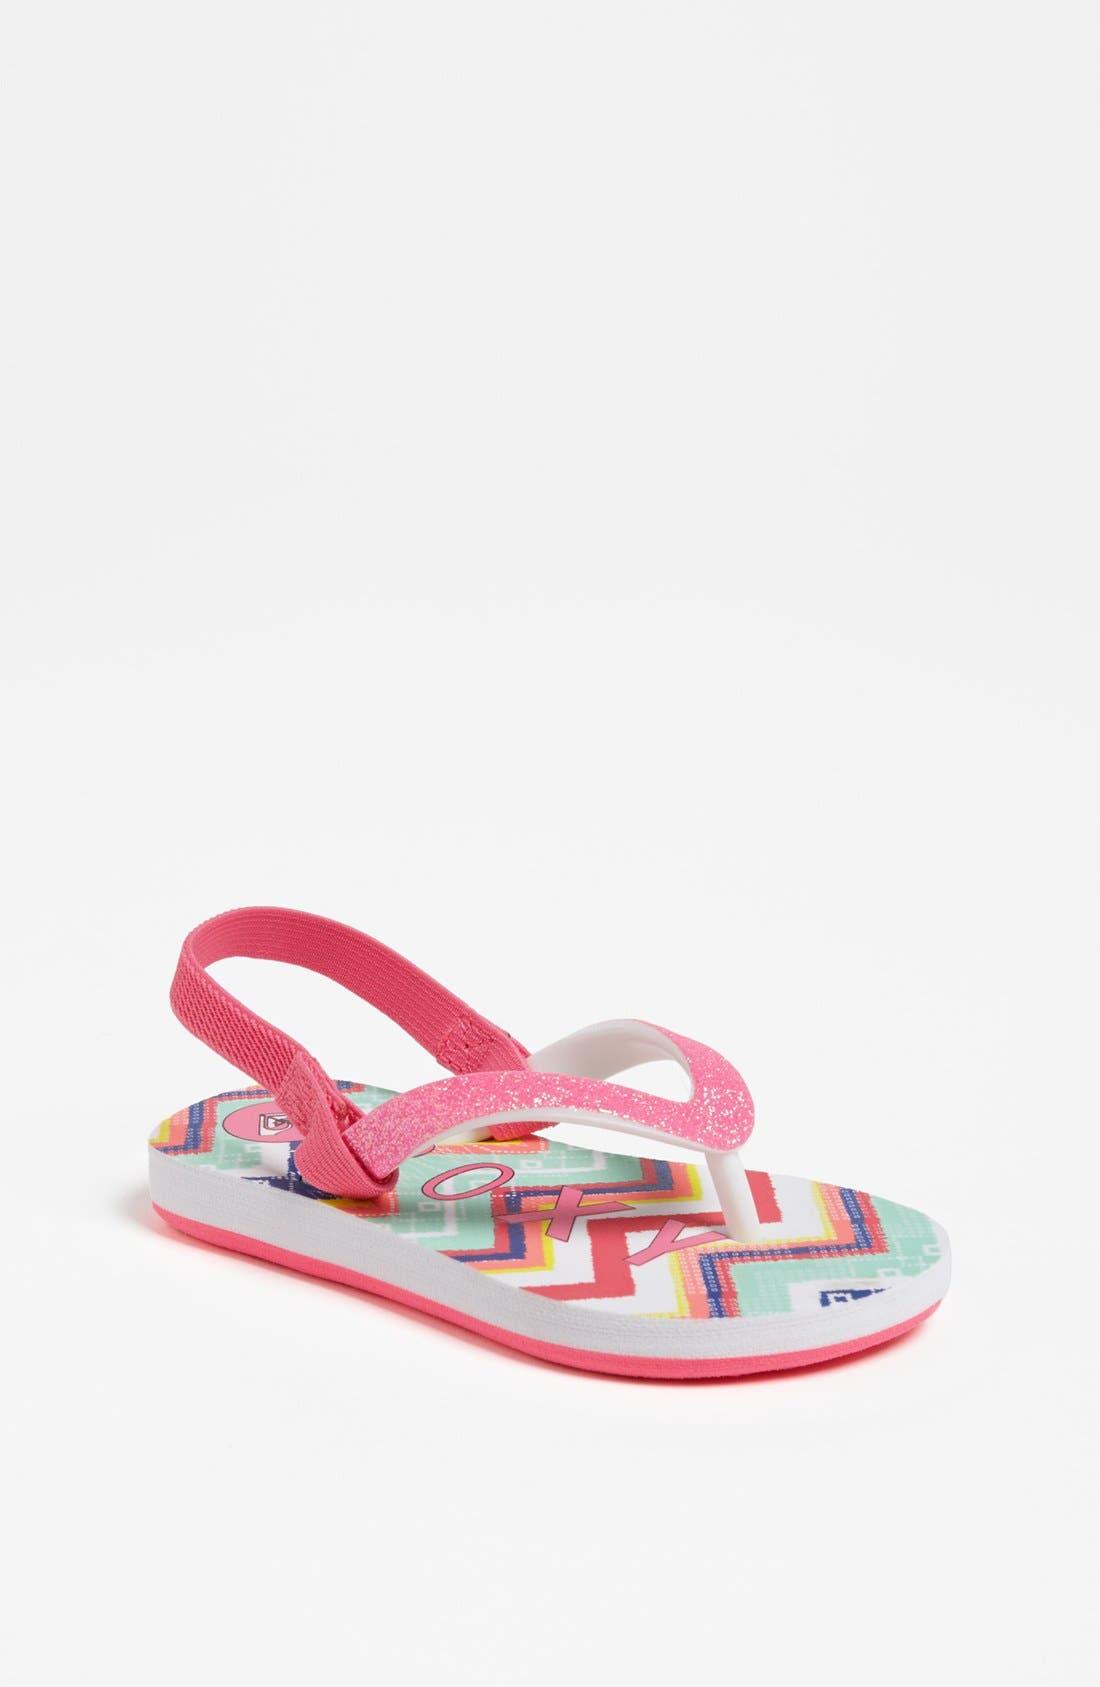 Alternate Image 1 Selected - Roxy 'Tahiti' Sandal (Walker & Toddler)